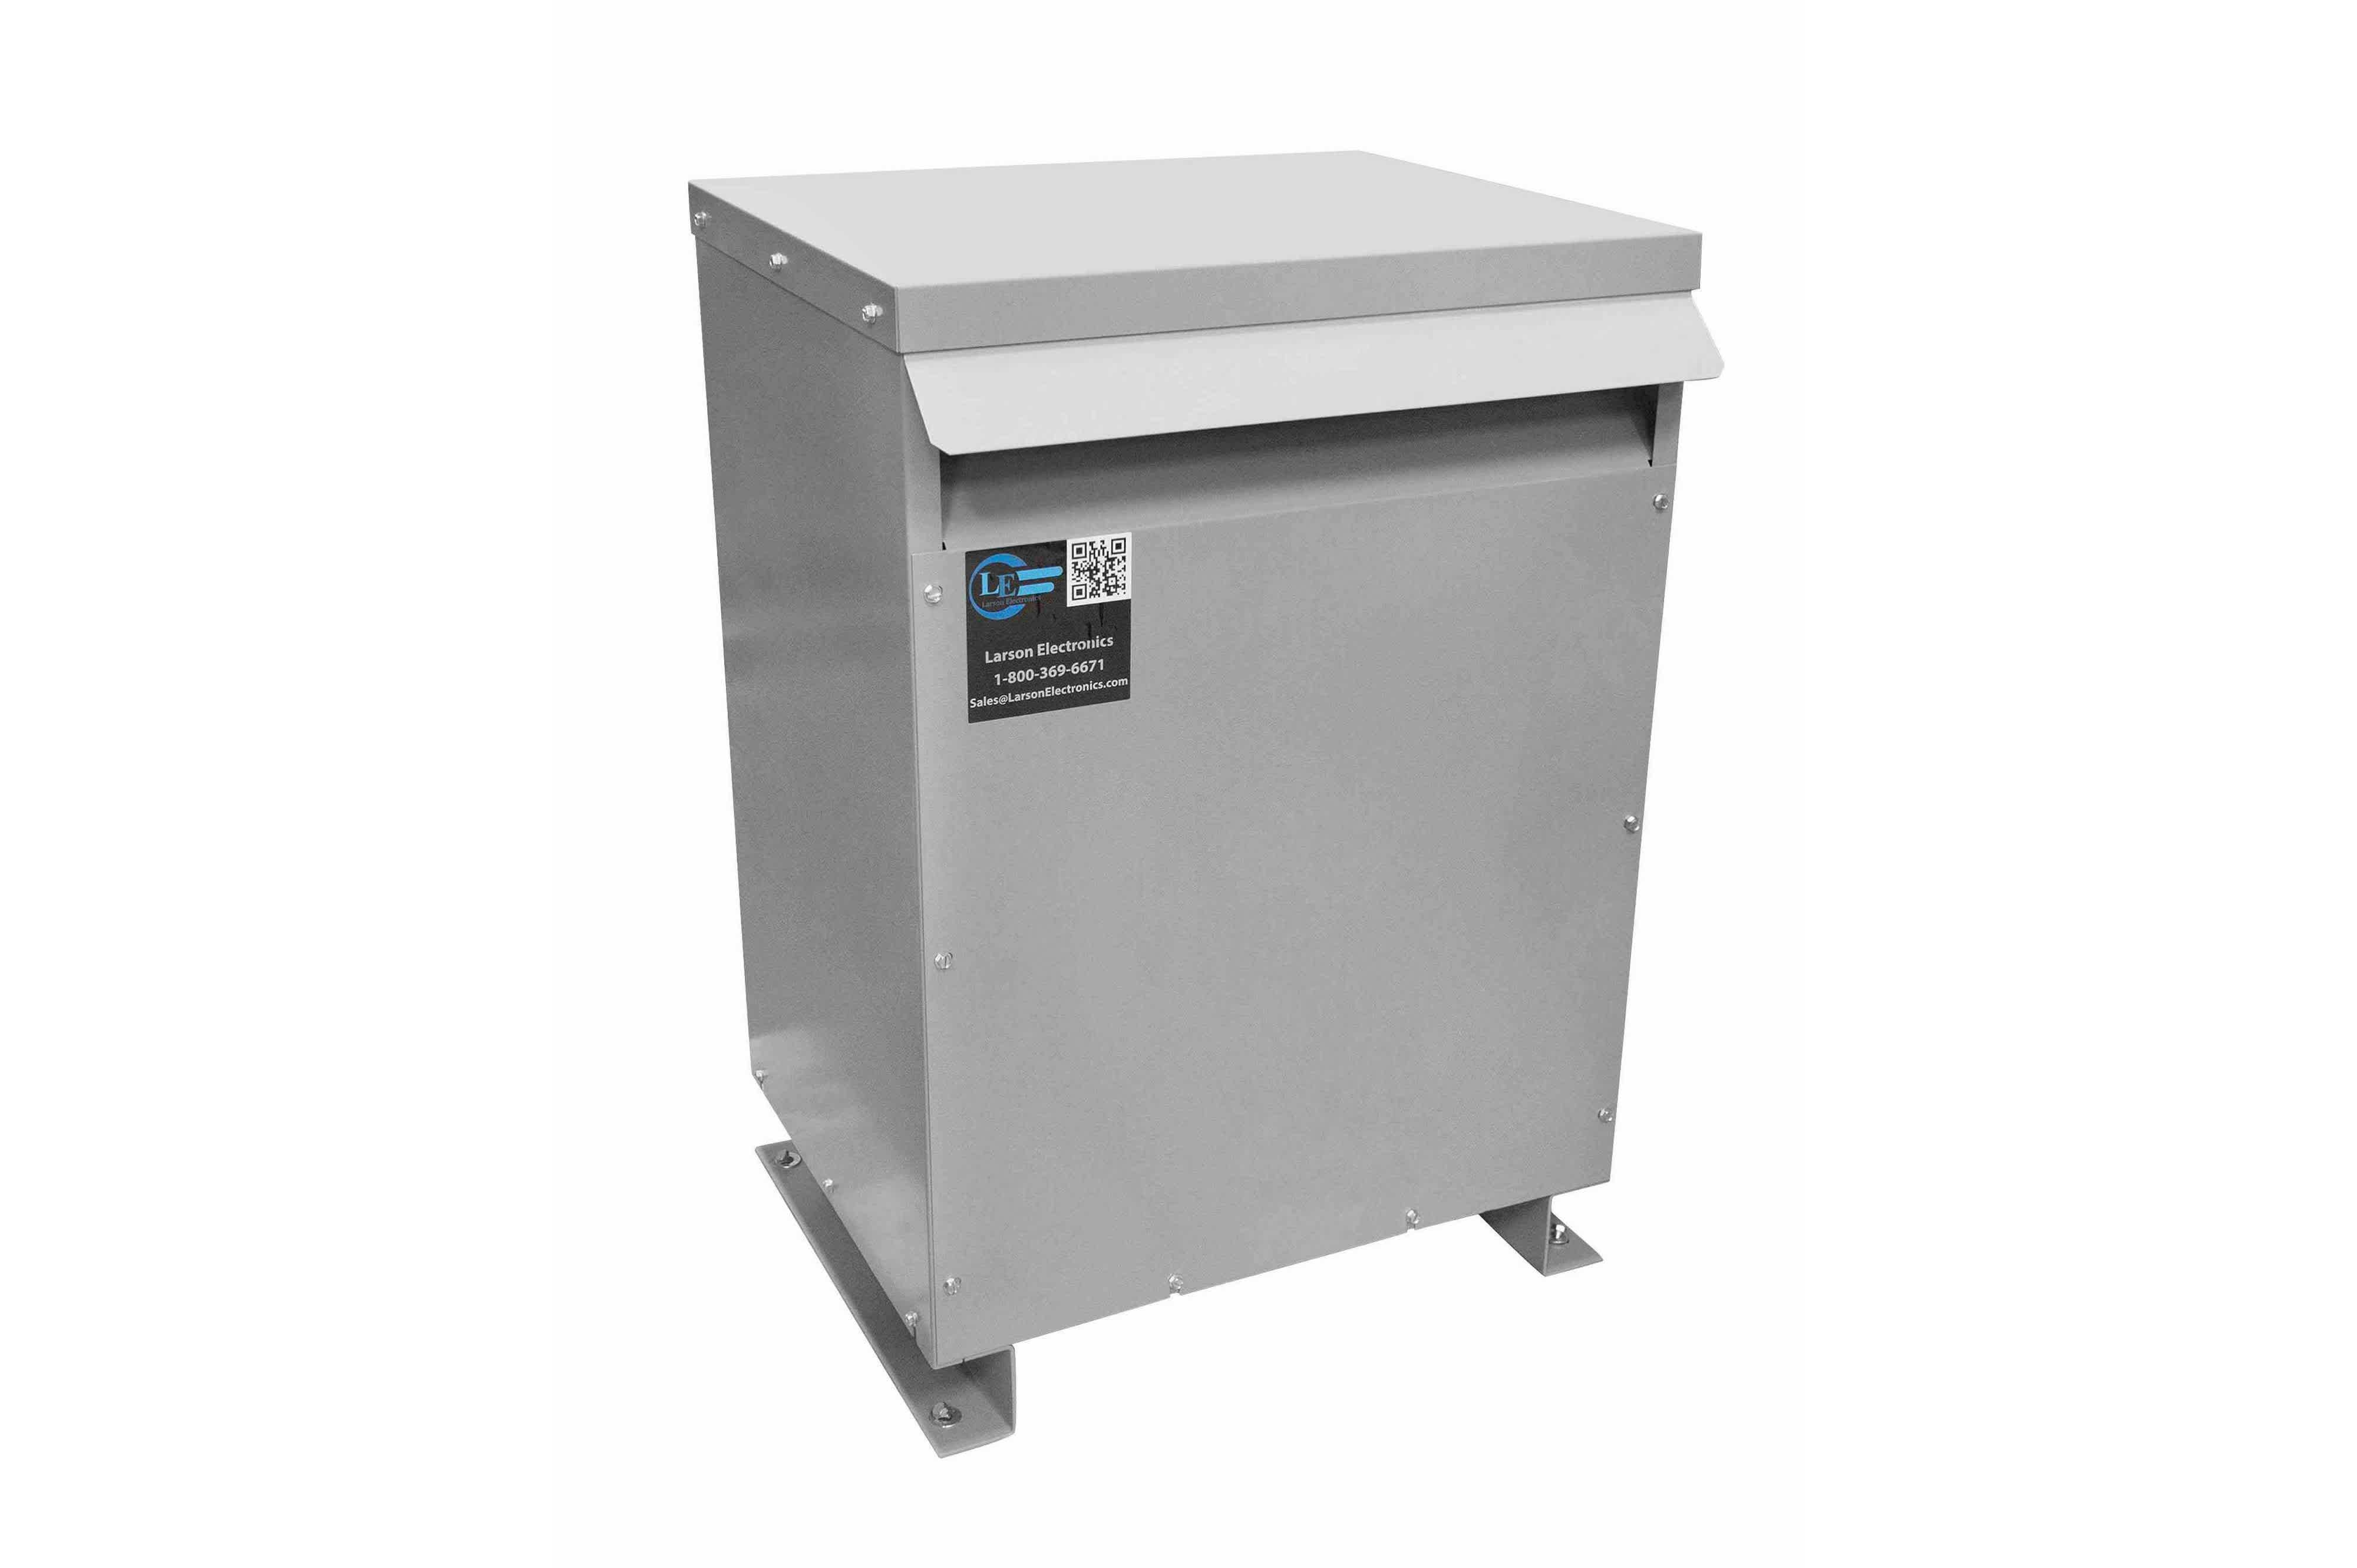 40 kVA 3PH Isolation Transformer, 460V Wye Primary, 575V Delta Secondary, N3R, Ventilated, 60 Hz